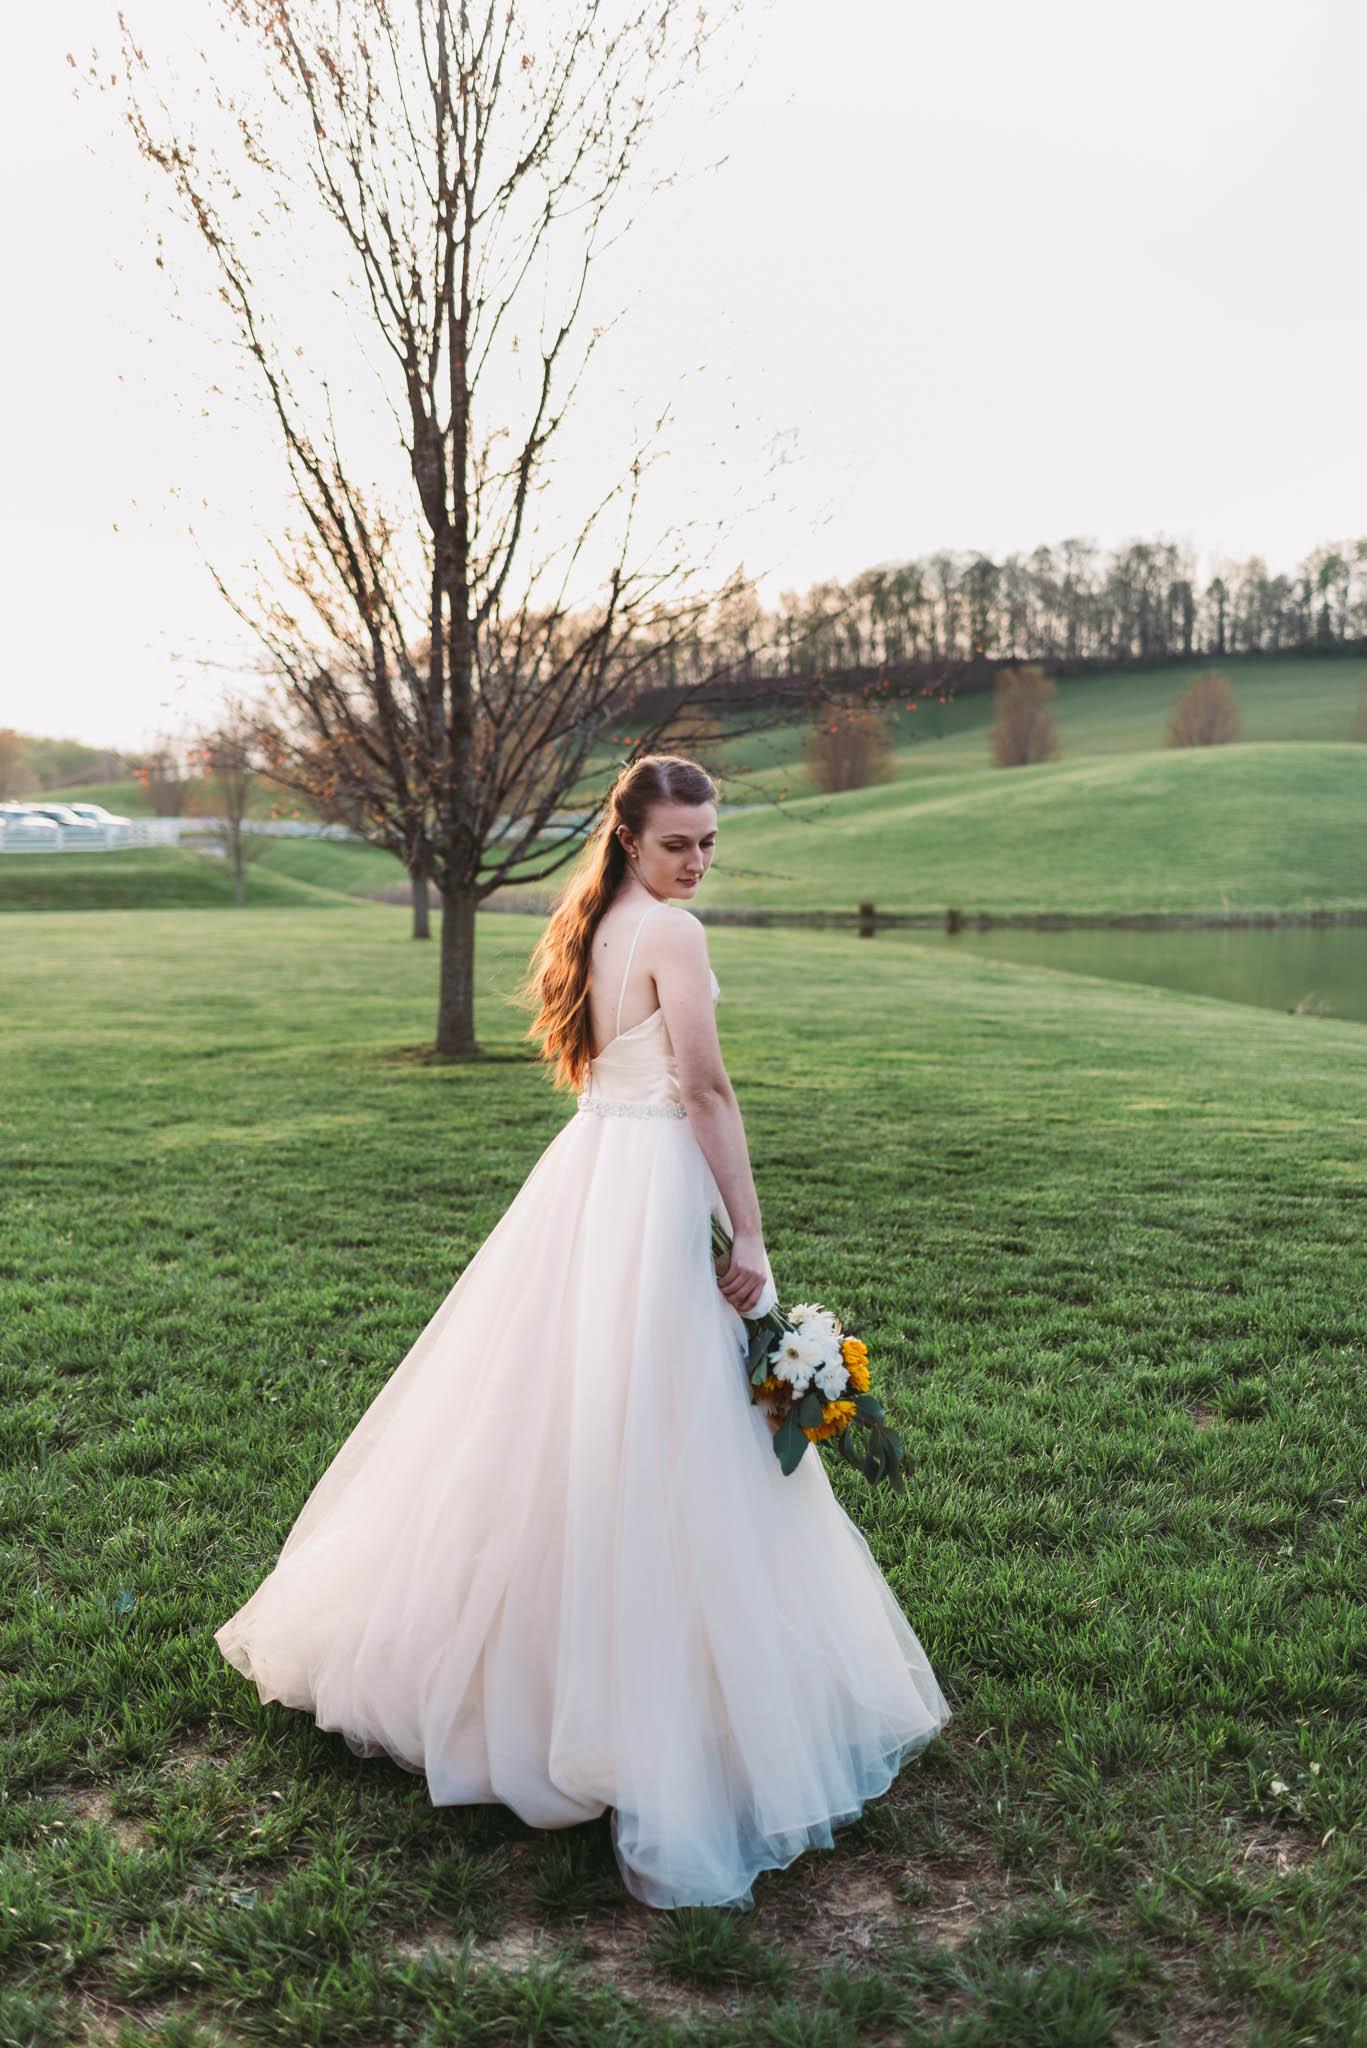 Grace Meadows Farm Wedding, Jonesborough, TN, Northeast TN Wedding Photographer, East Tennessee Wedding Photographer, Knoxville, TN Wedding Photographer (1 of 1)-8.jpg